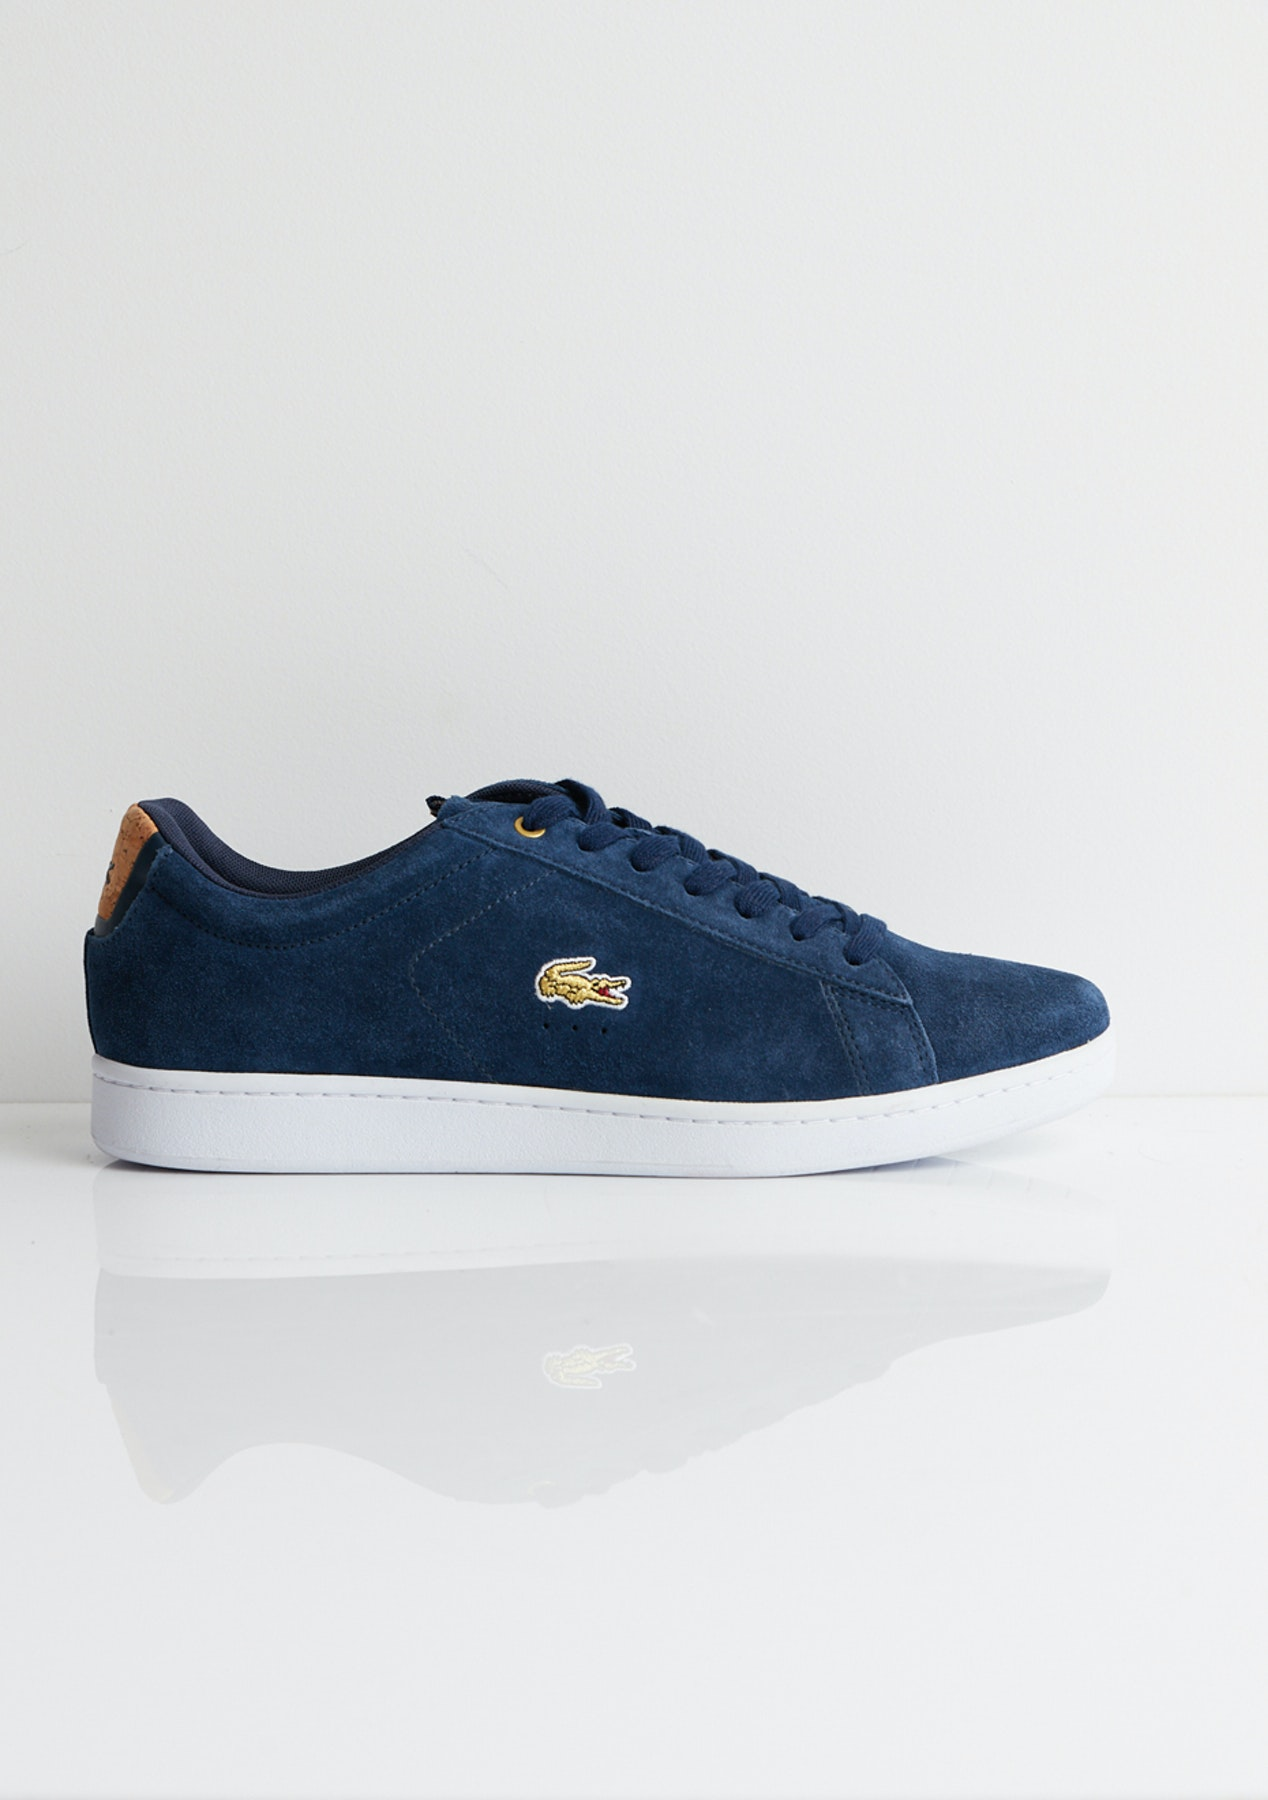 83093aba247e Lacoste Shoes - Mens - 31 - All Shoes  60 - Onceit